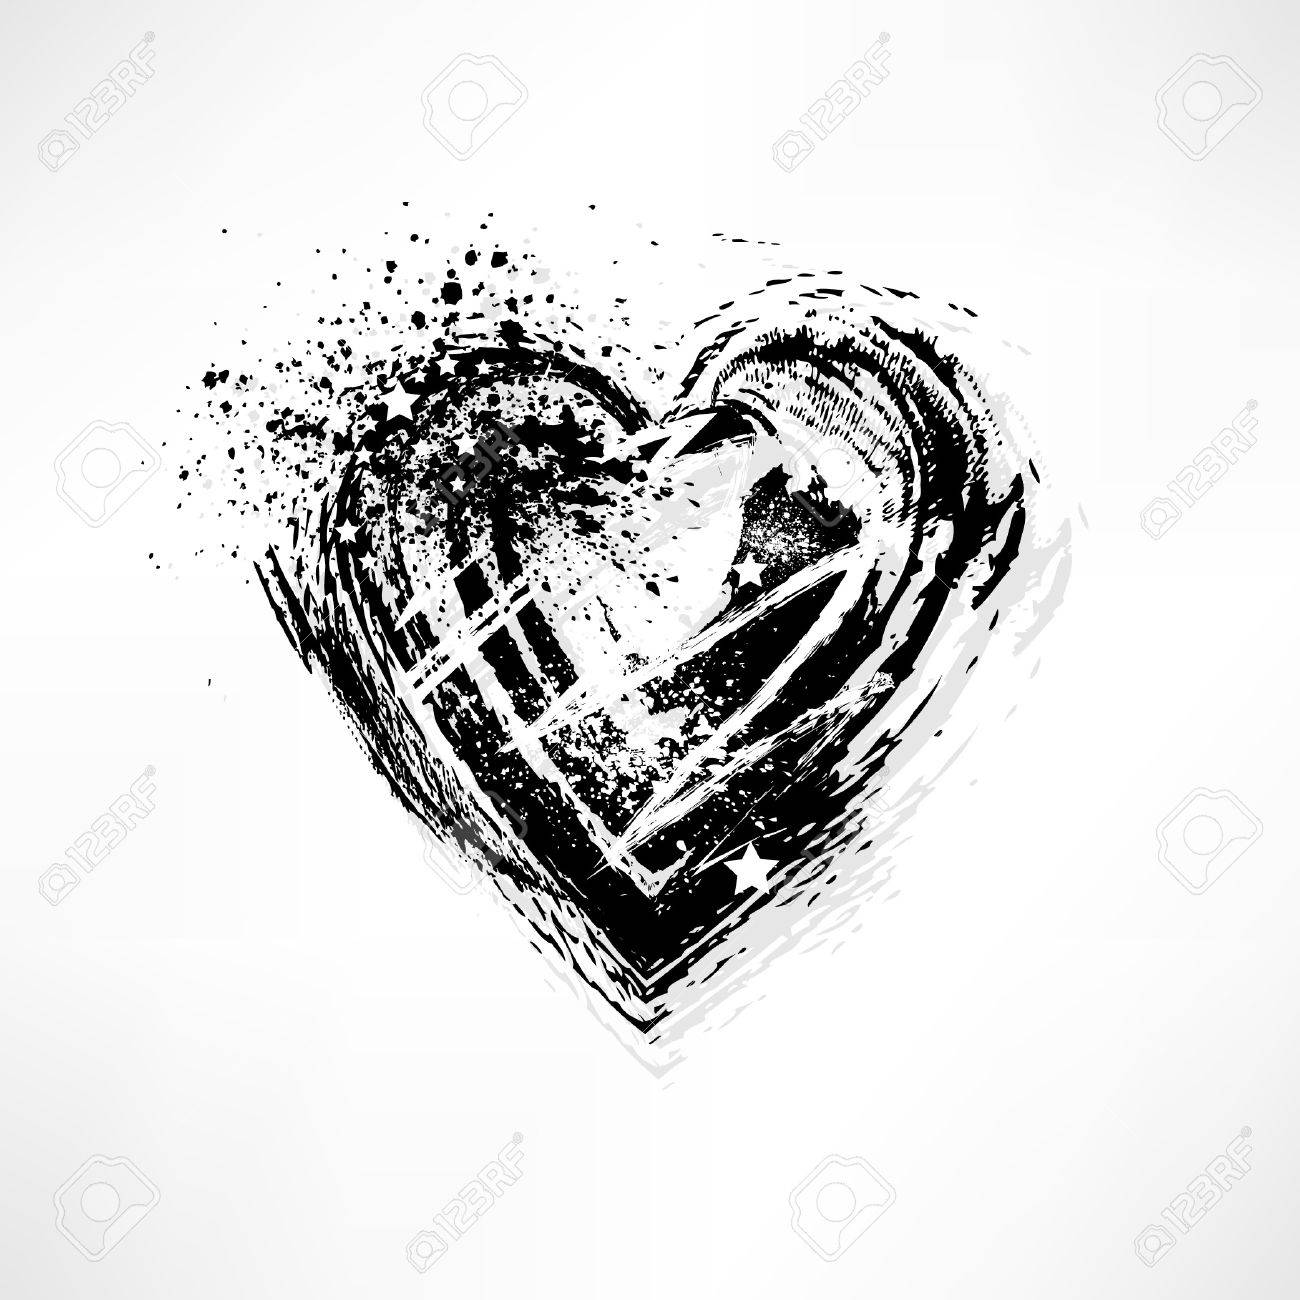 Painted brush heart shape Stock Vector - 11659940